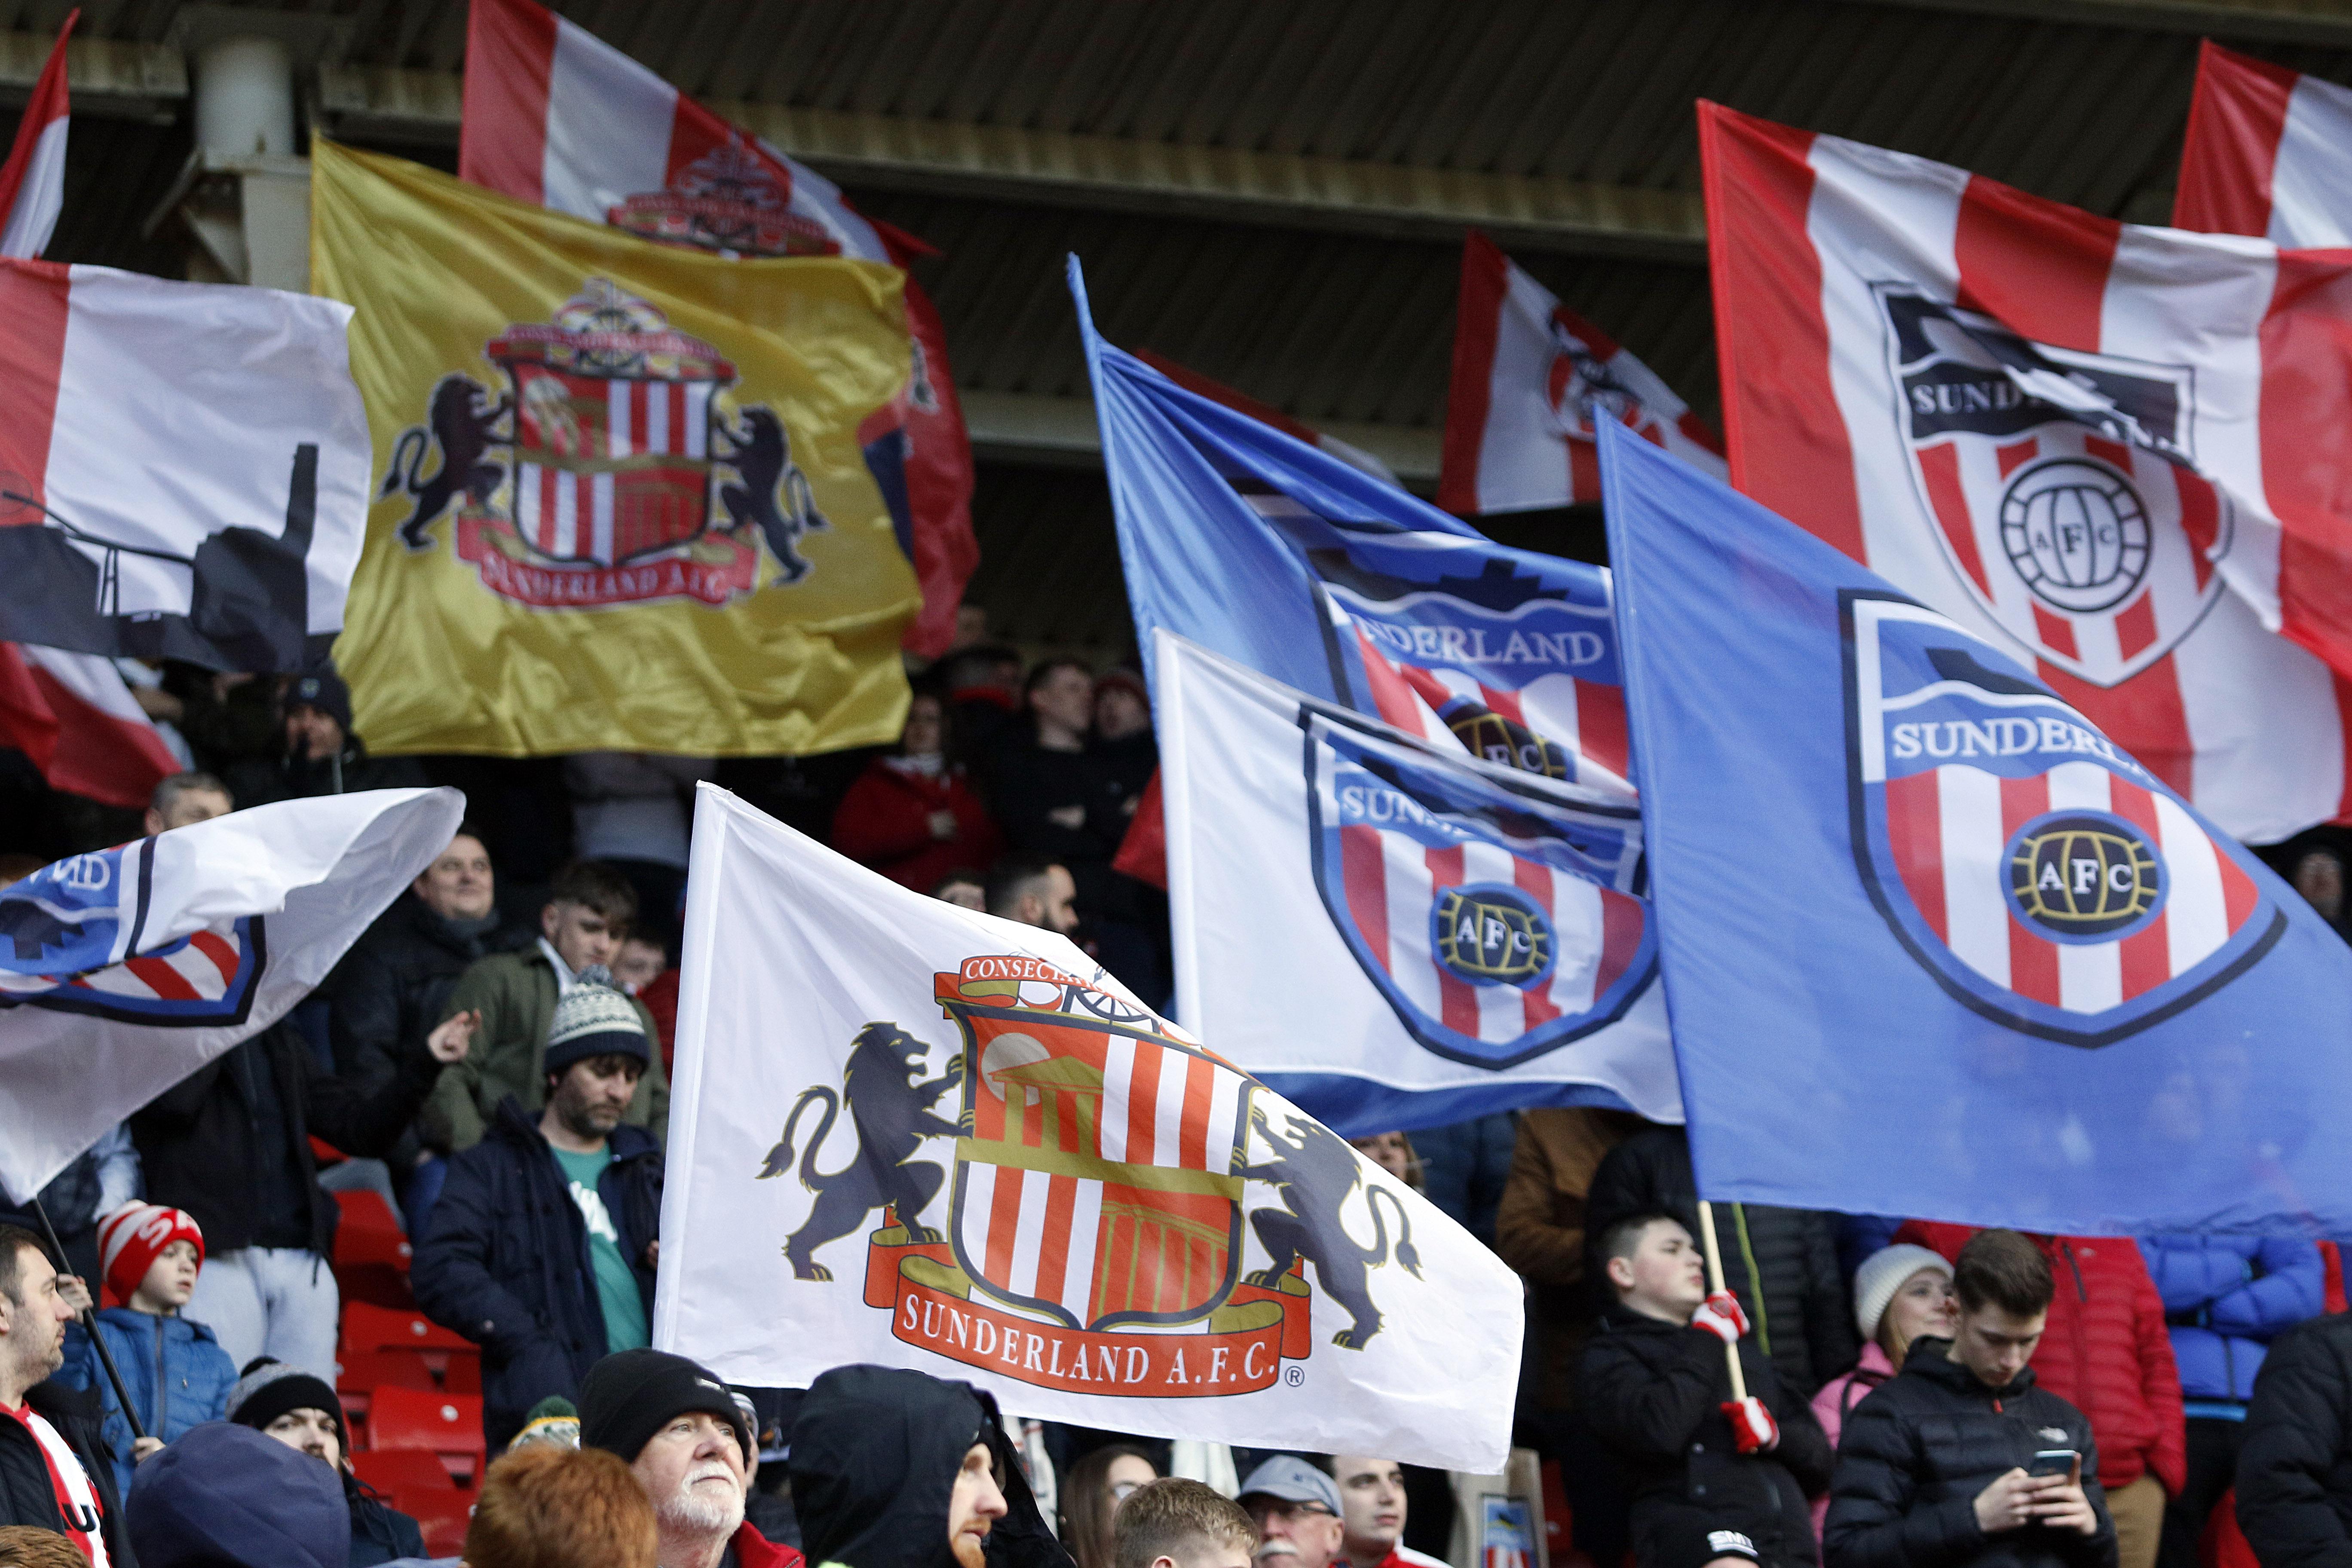 Sunderland v Ipswich Town - Sky Bet League One